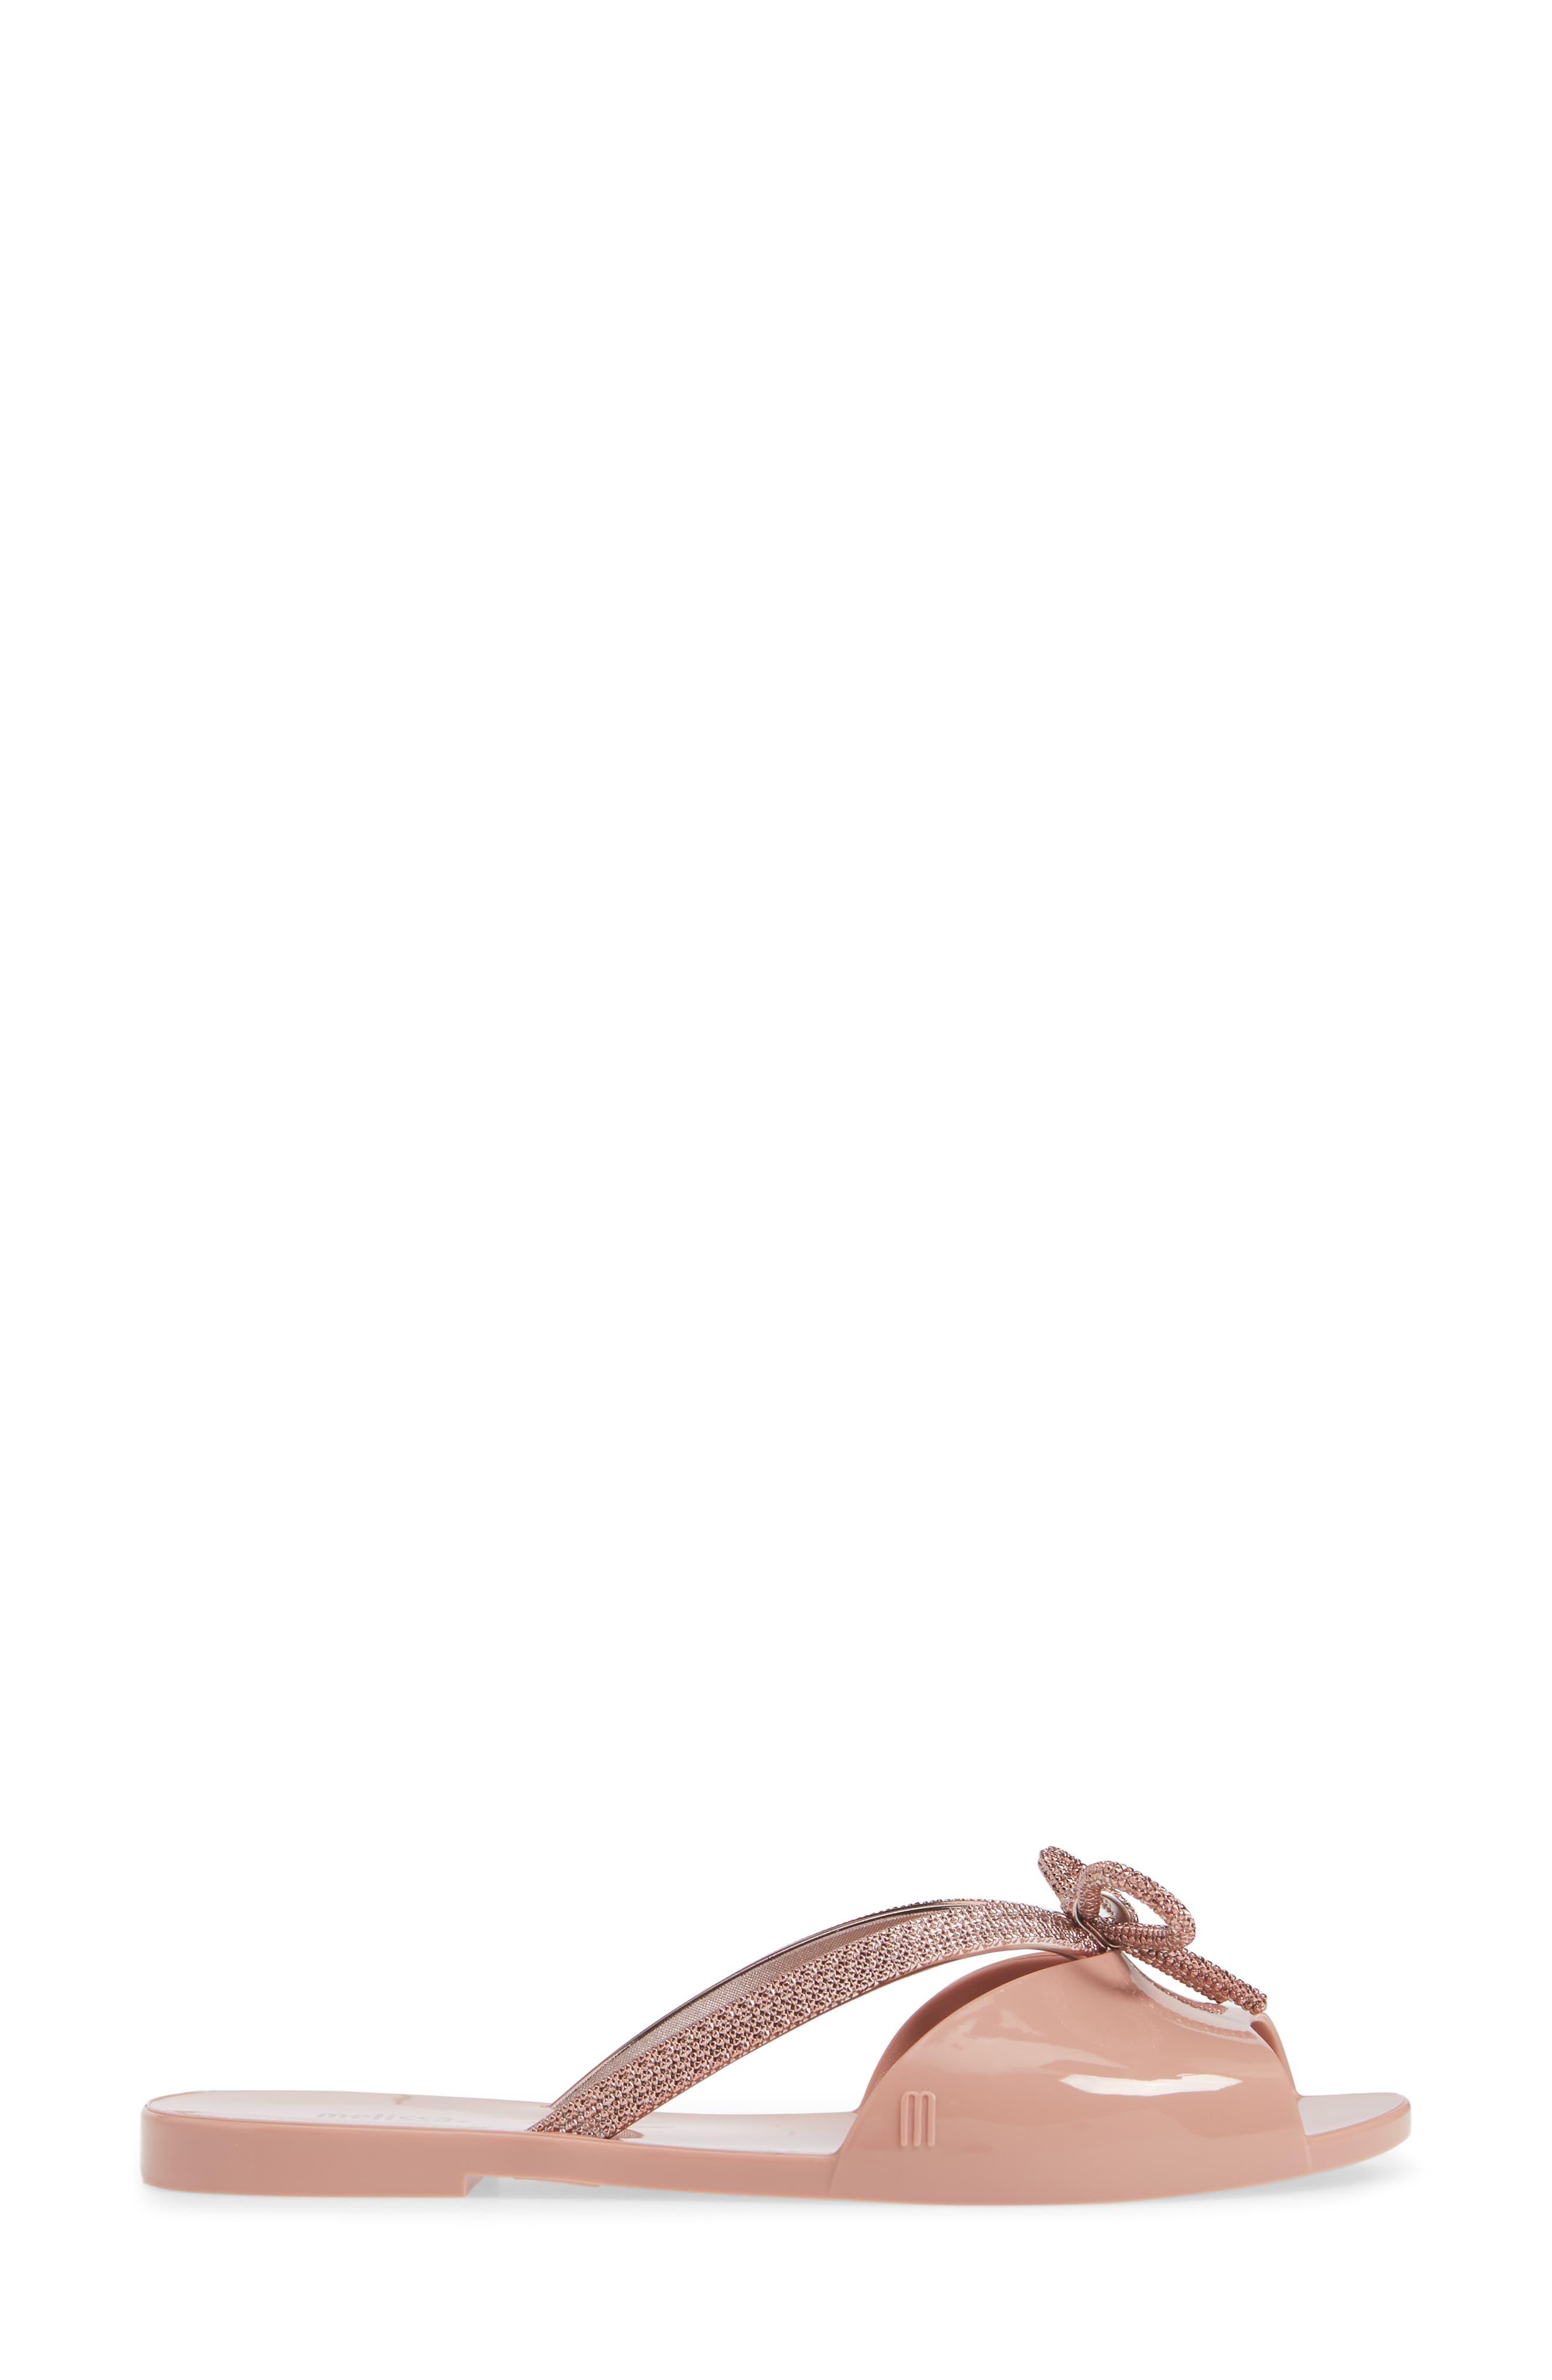 Ela Chrome Slide Sandal,                             Alternate thumbnail 3, color,                             METALLIC PINK RUBBER